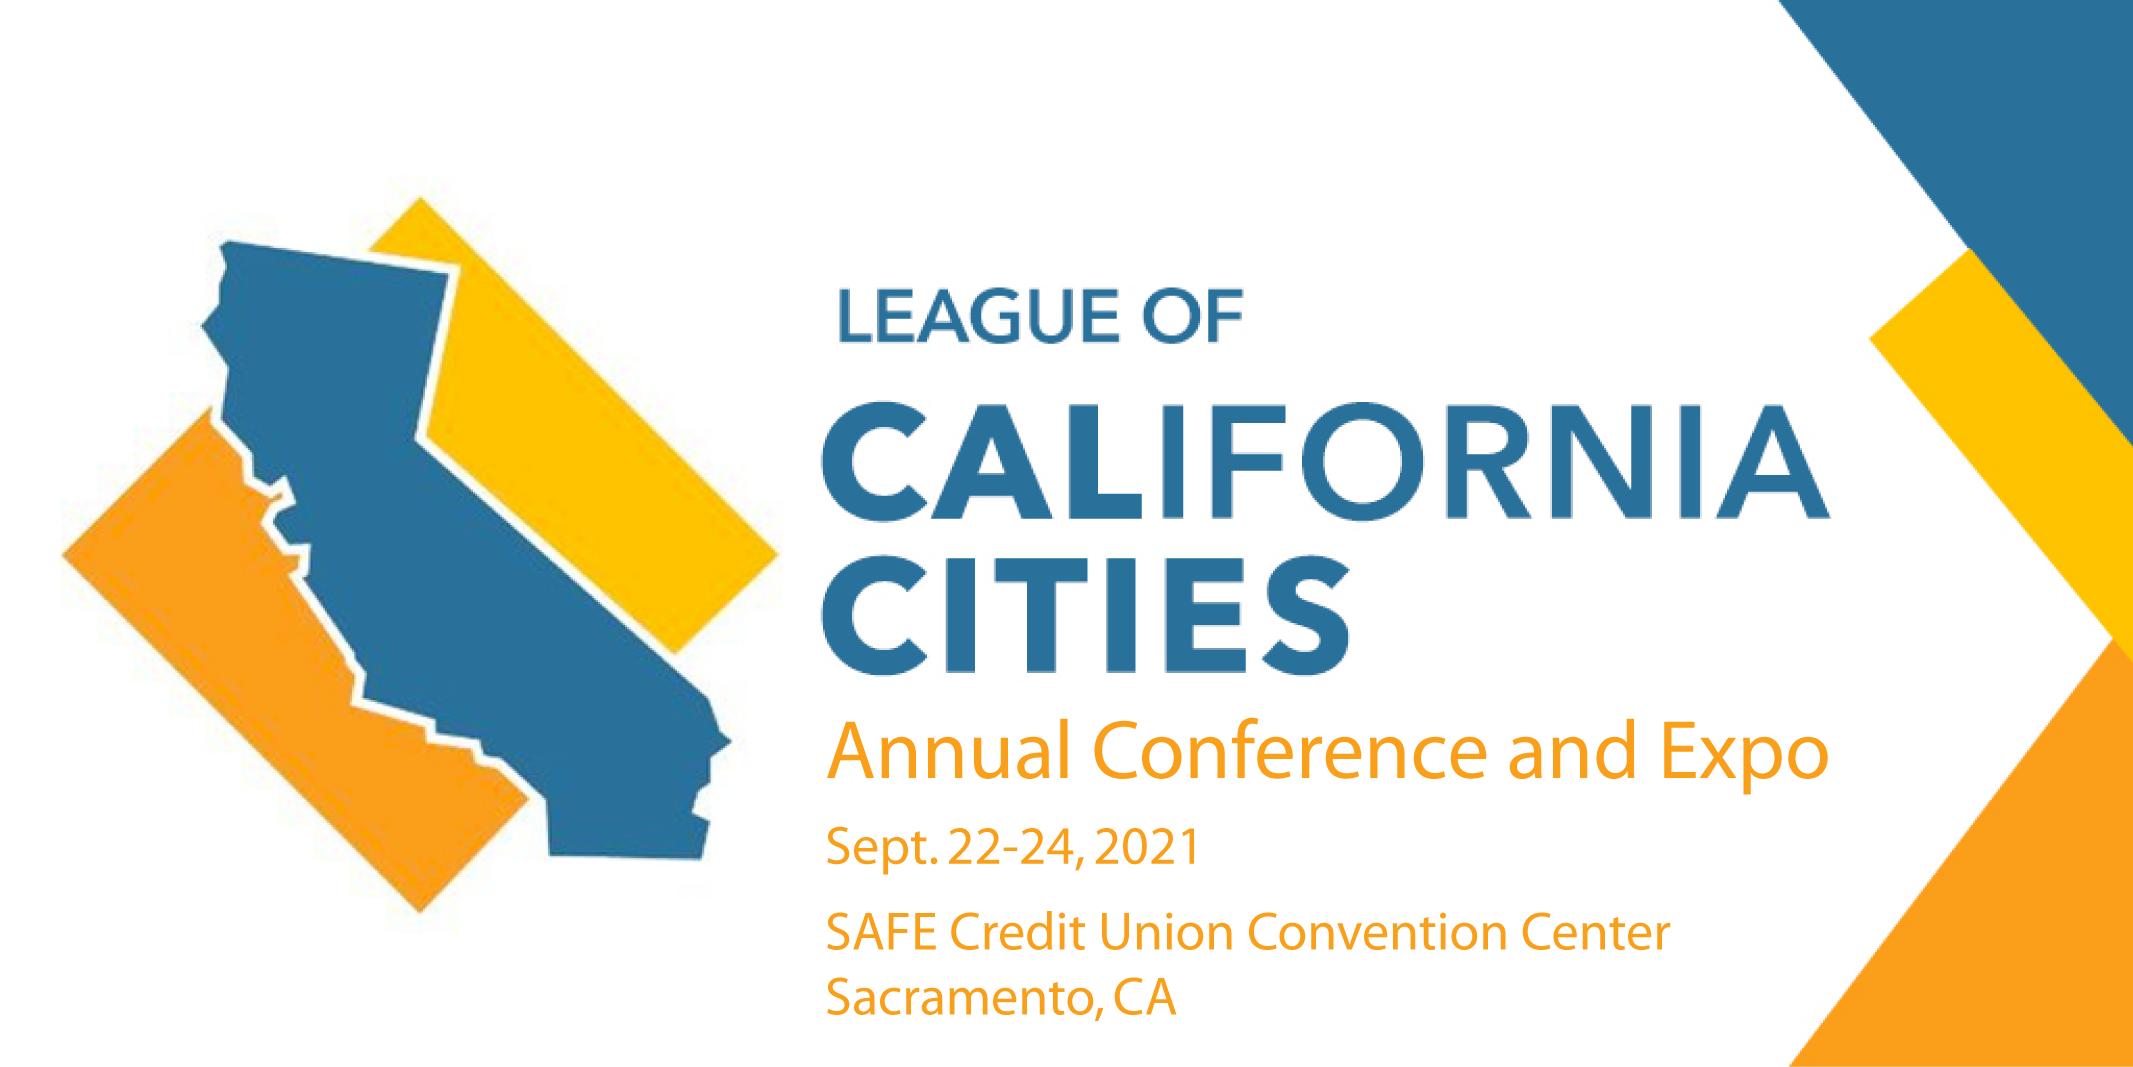 League of California Cities Conference and Expo | Sept. 22 – 24, 2021 | Sacramento, CA